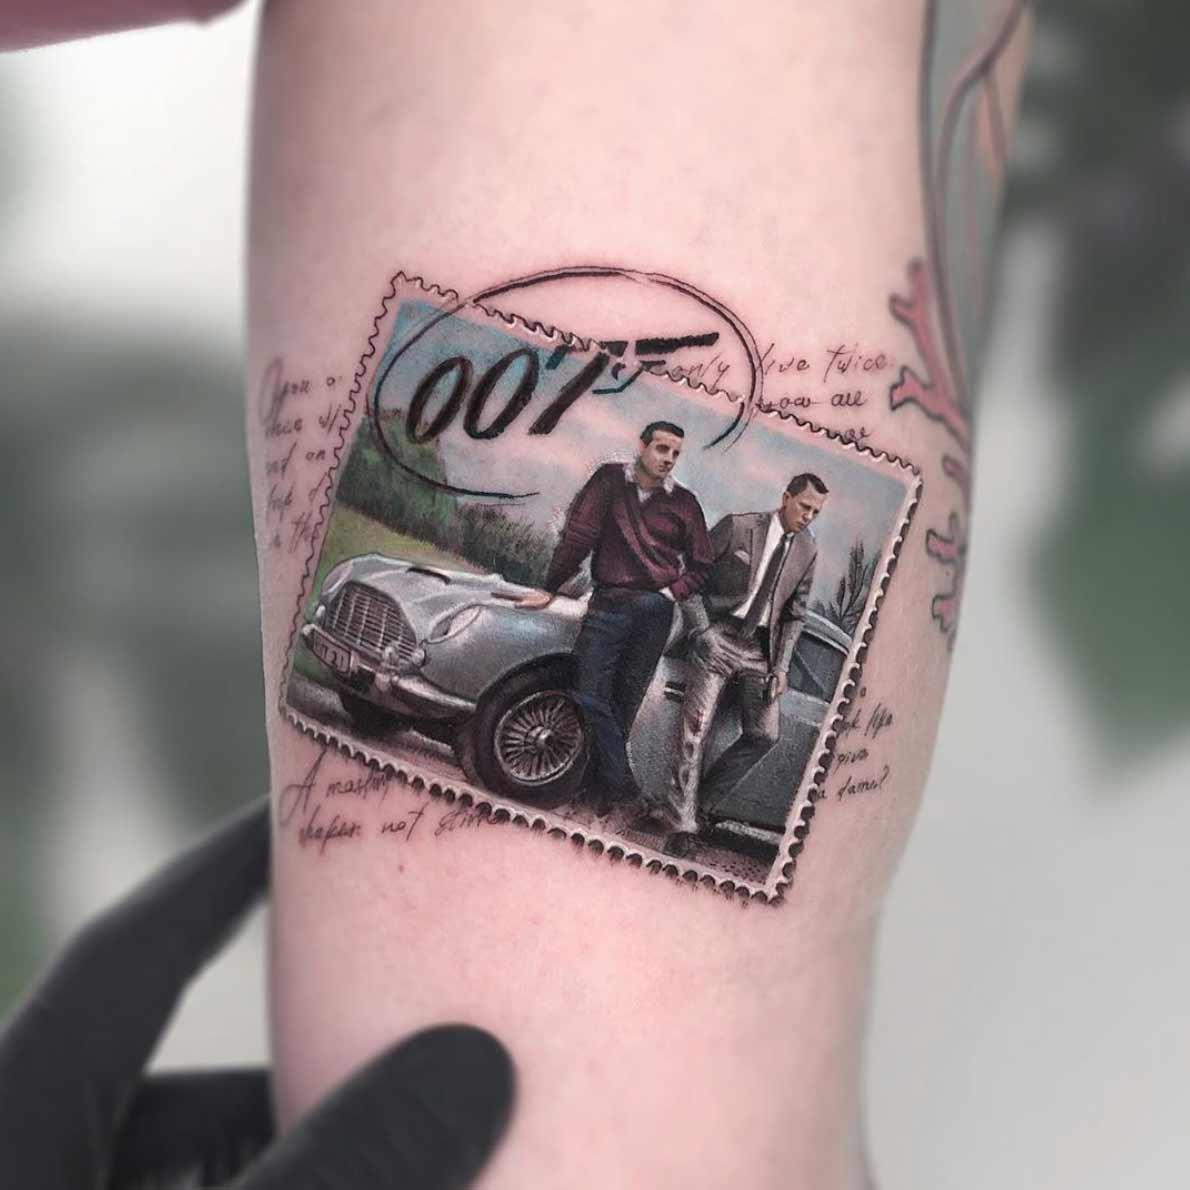 Gestochene Popkultur-Liebe von Eden Kozokaro aka Kozo Tattoo kozo-tattoos_02